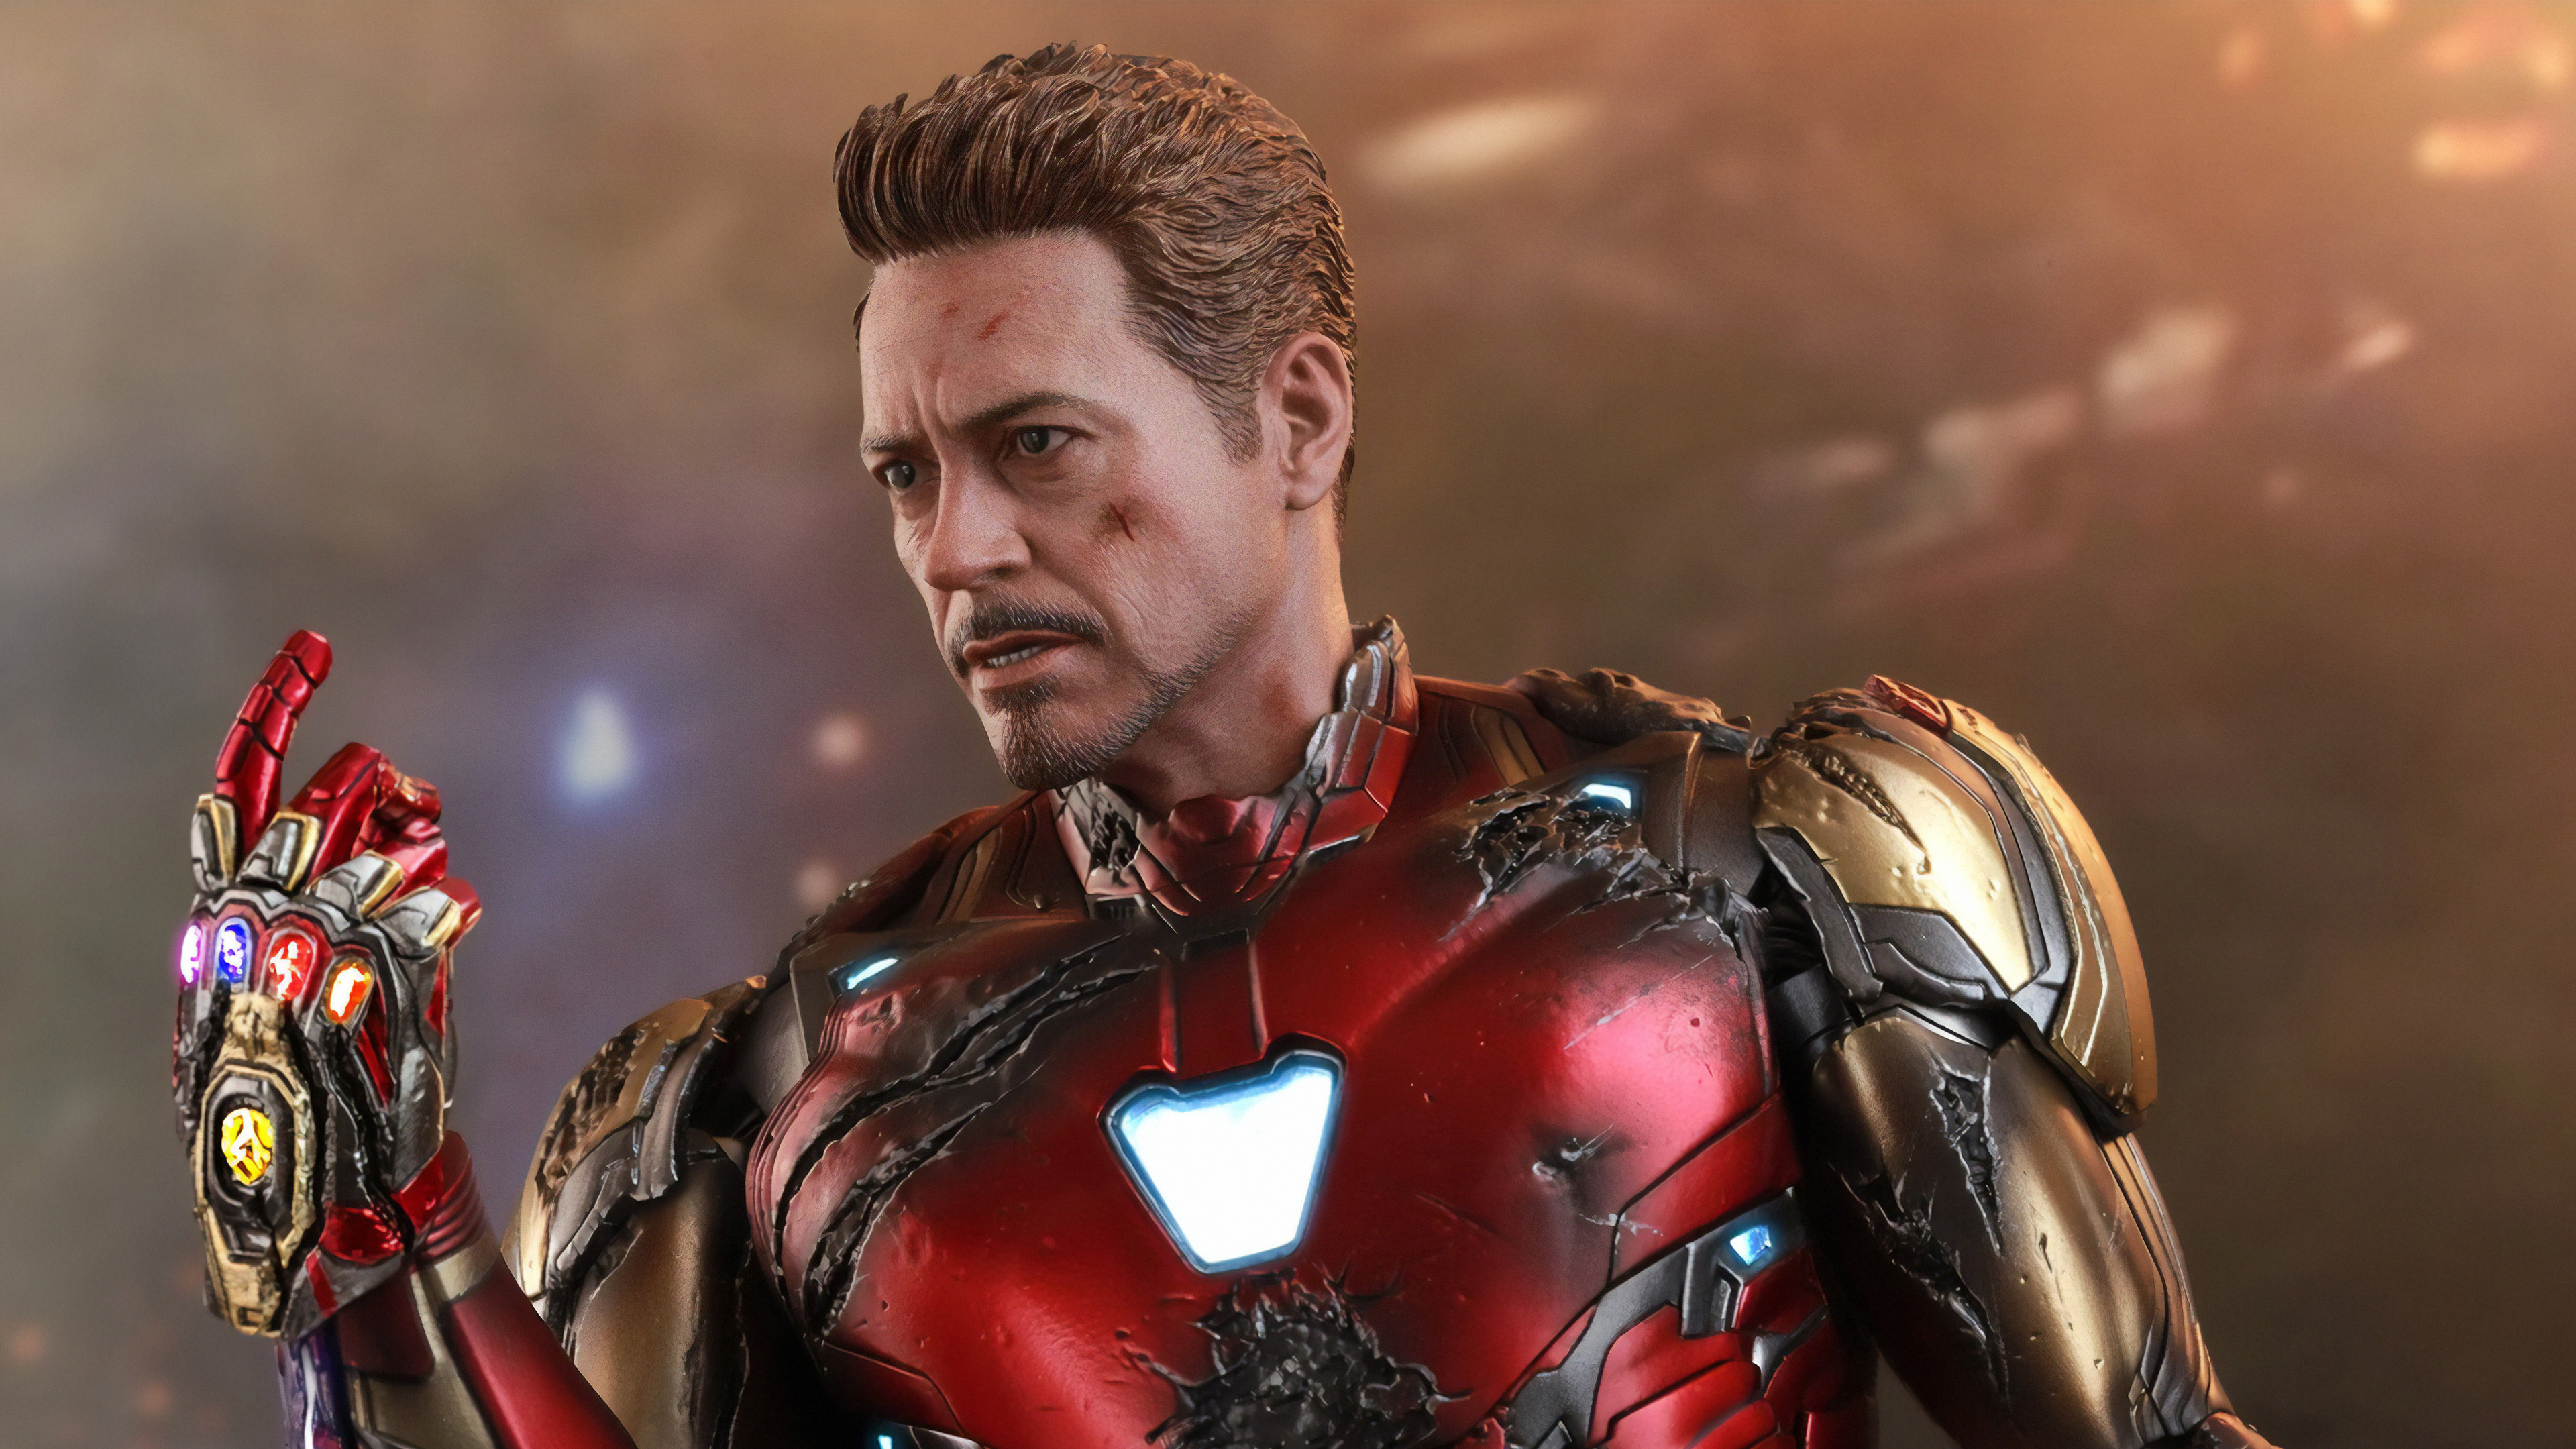 Iron Man Infinity Gauntlet 4k 2019, HD Superheroes, 4k Wallpapers, Images, Backgrounds, Photos ...